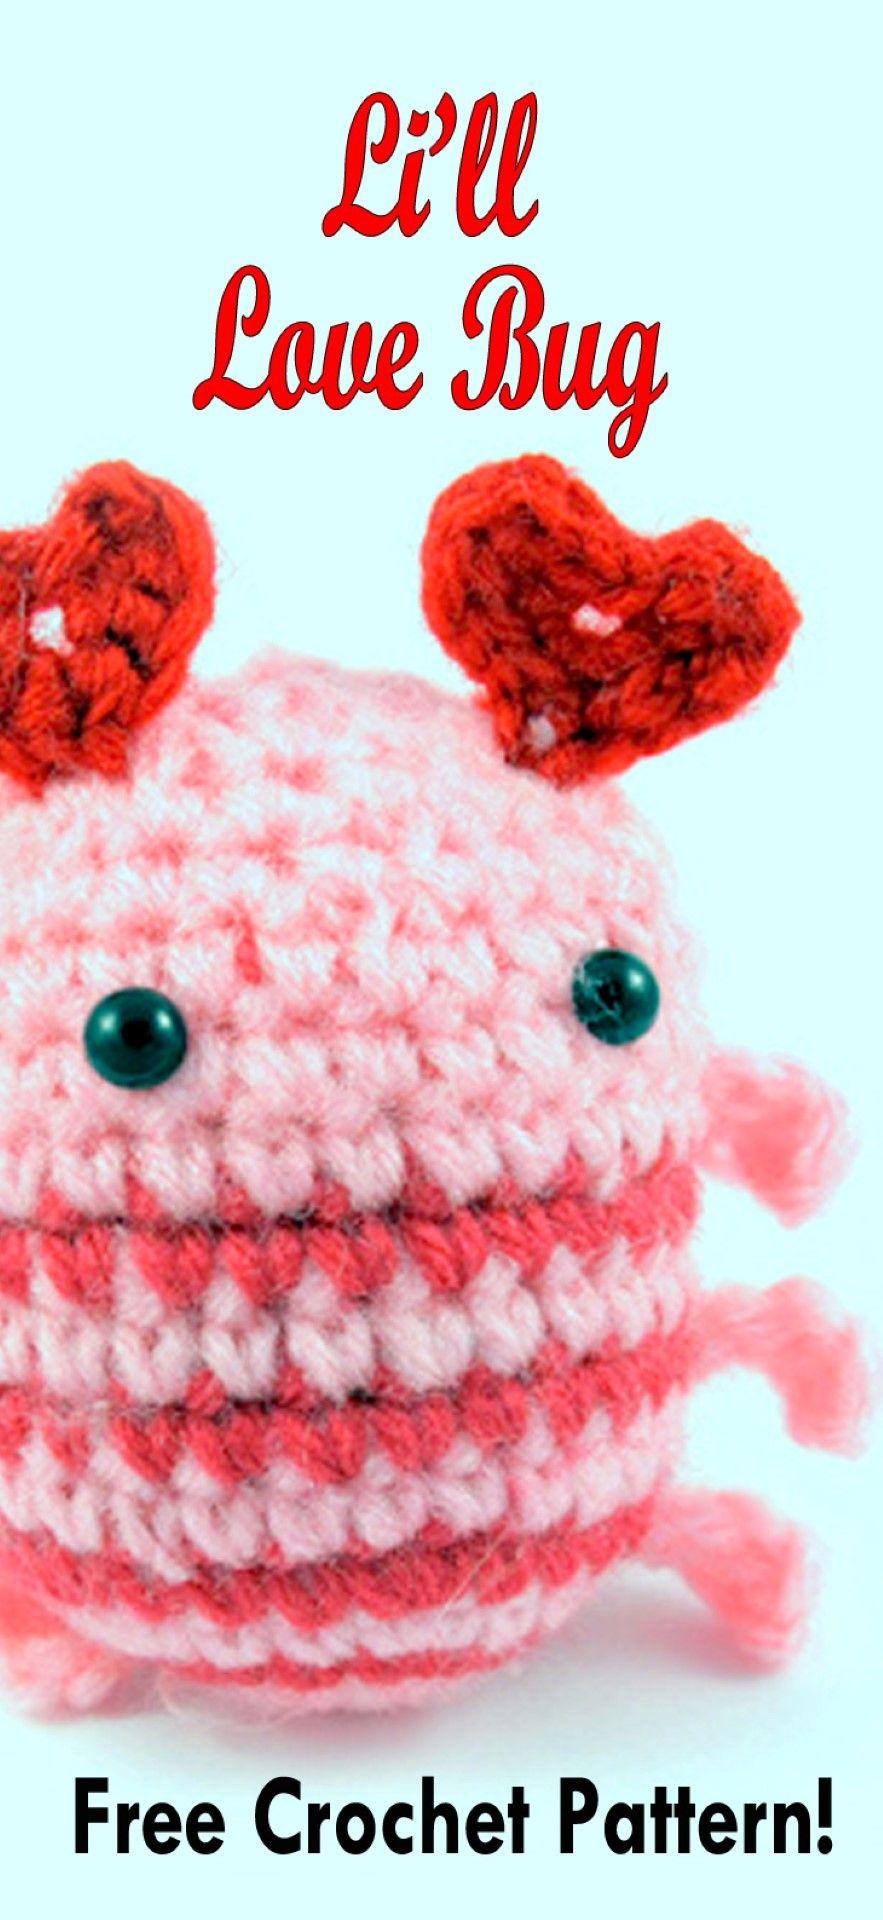 Valentine Crochet Patterns Interesting Design Inspiration